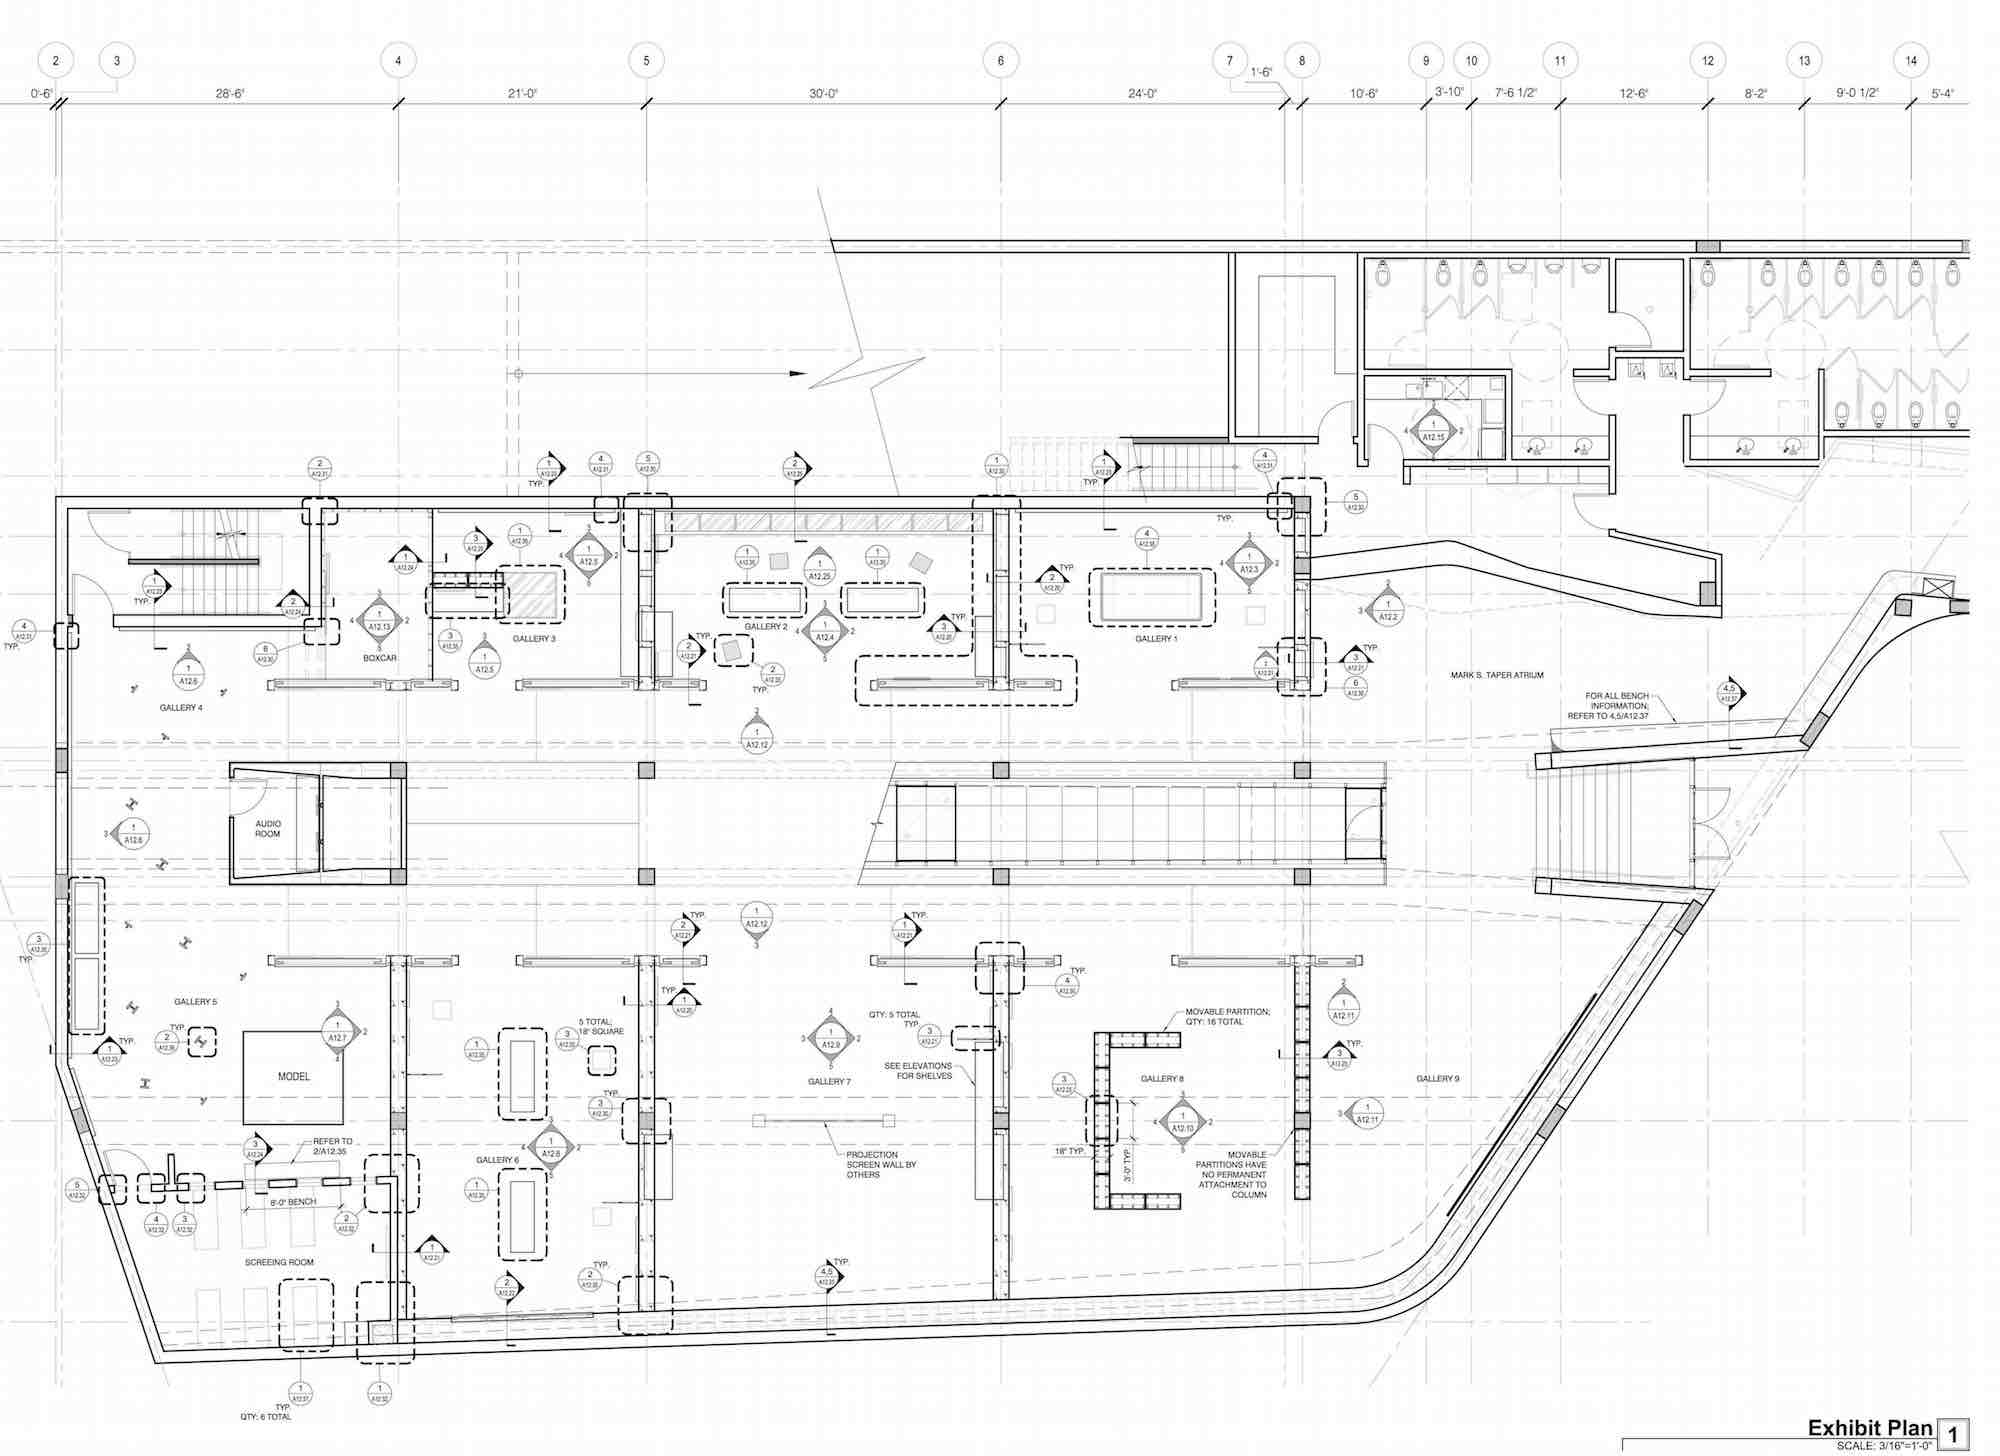 A12.1 Exhibit Plan